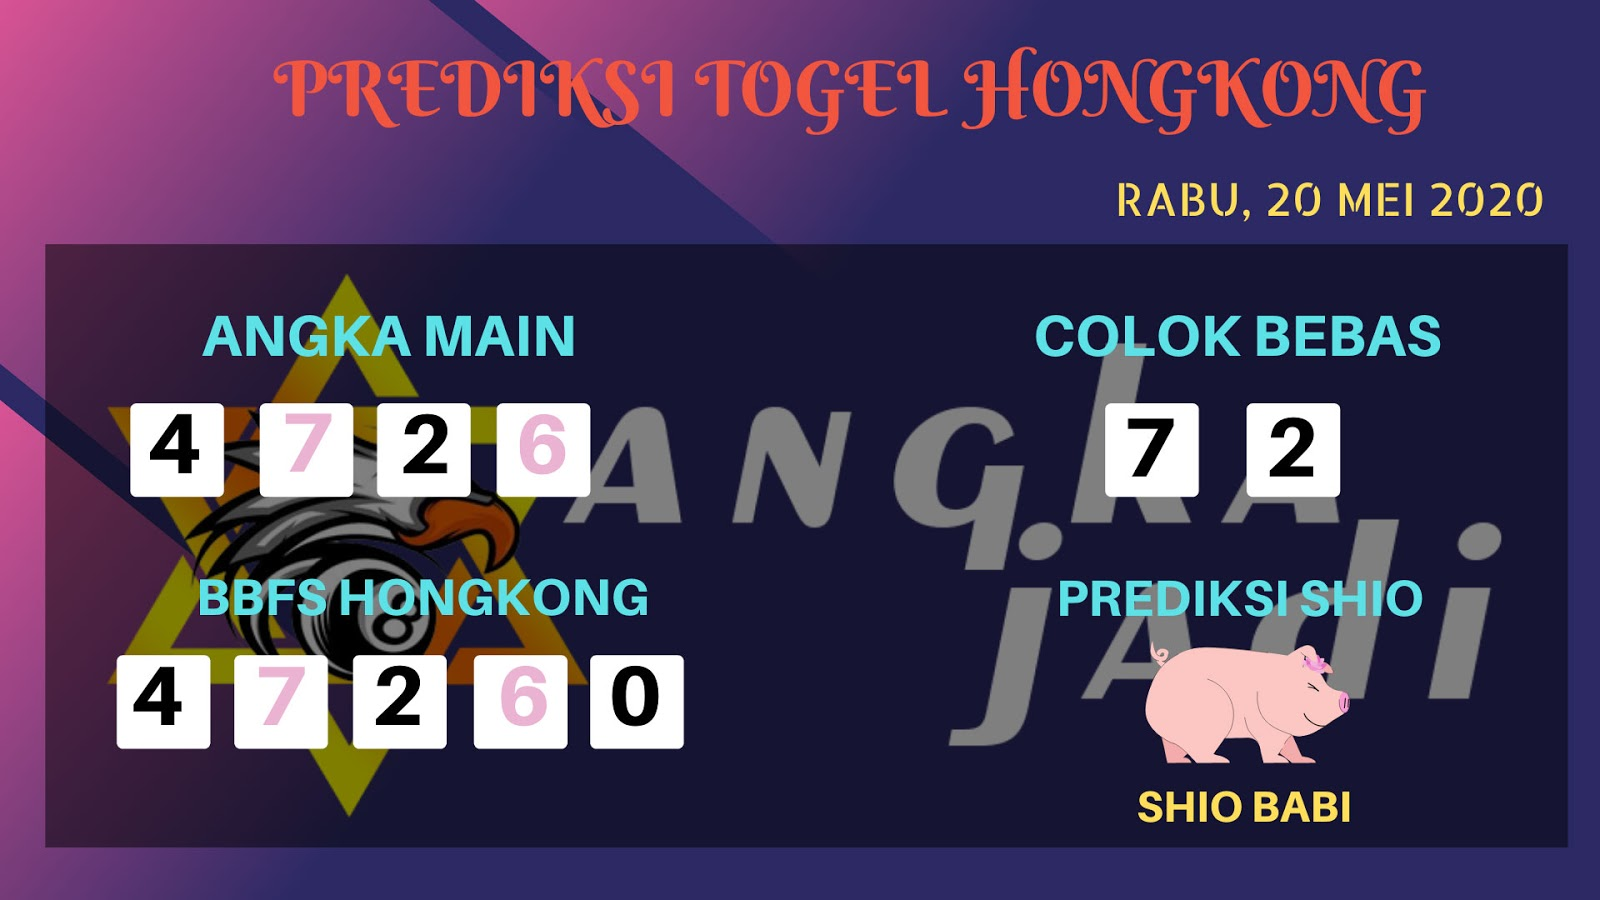 Prediksi HK Rabu 20 Mei 2020 - Bocoran HK